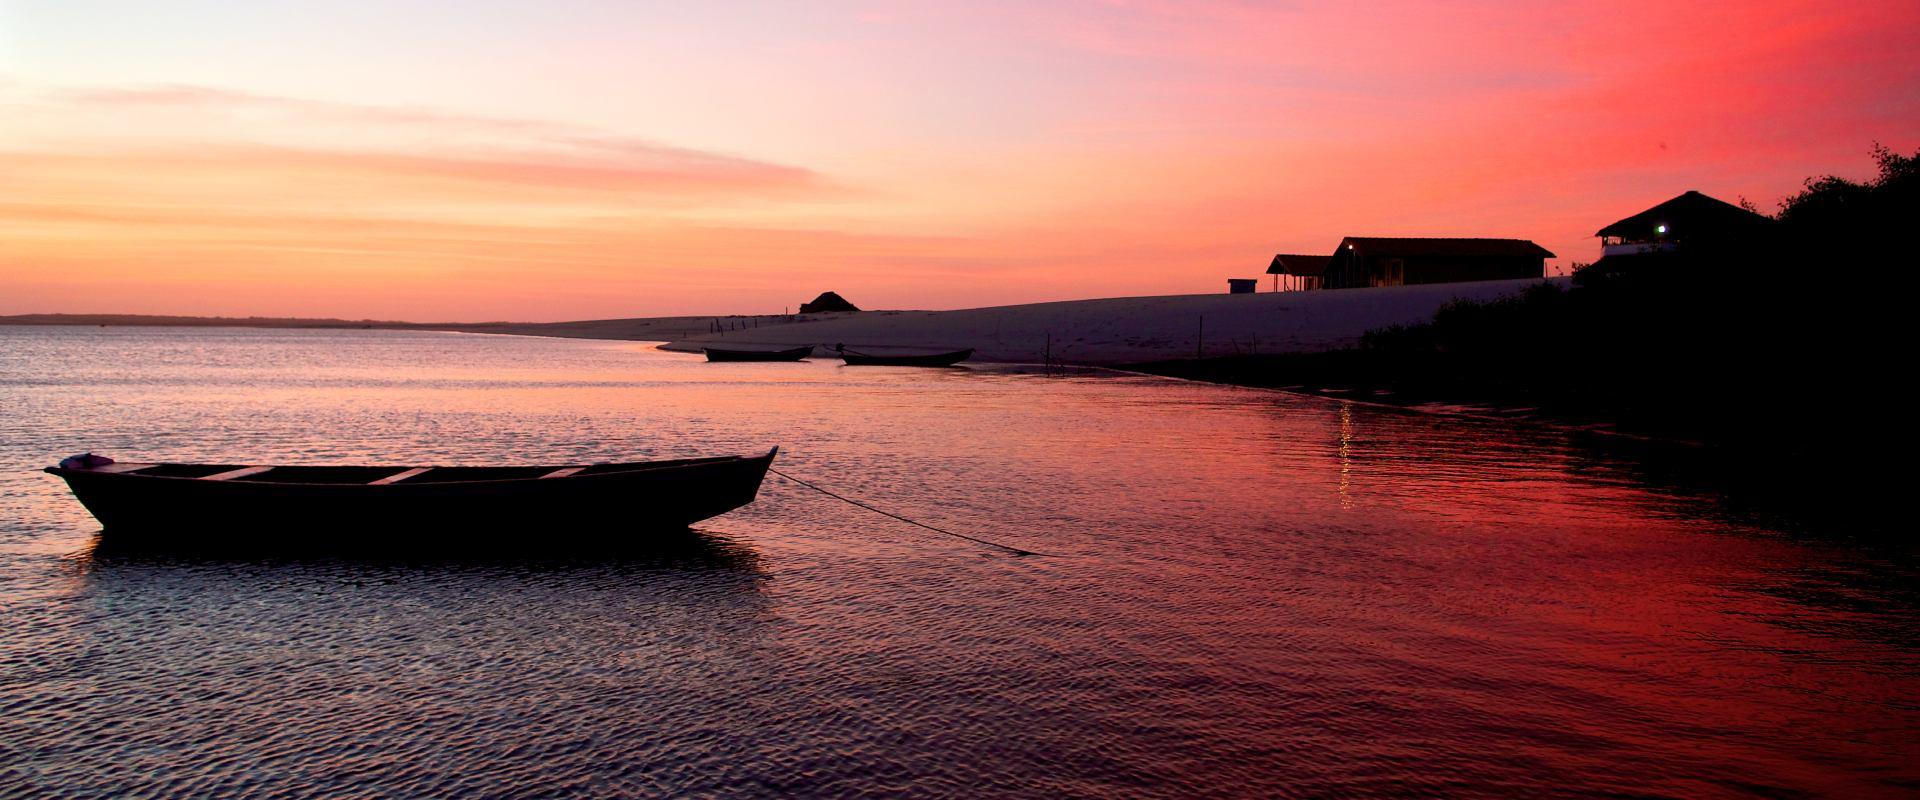 Sunset view at Convento Arcadia, Atins